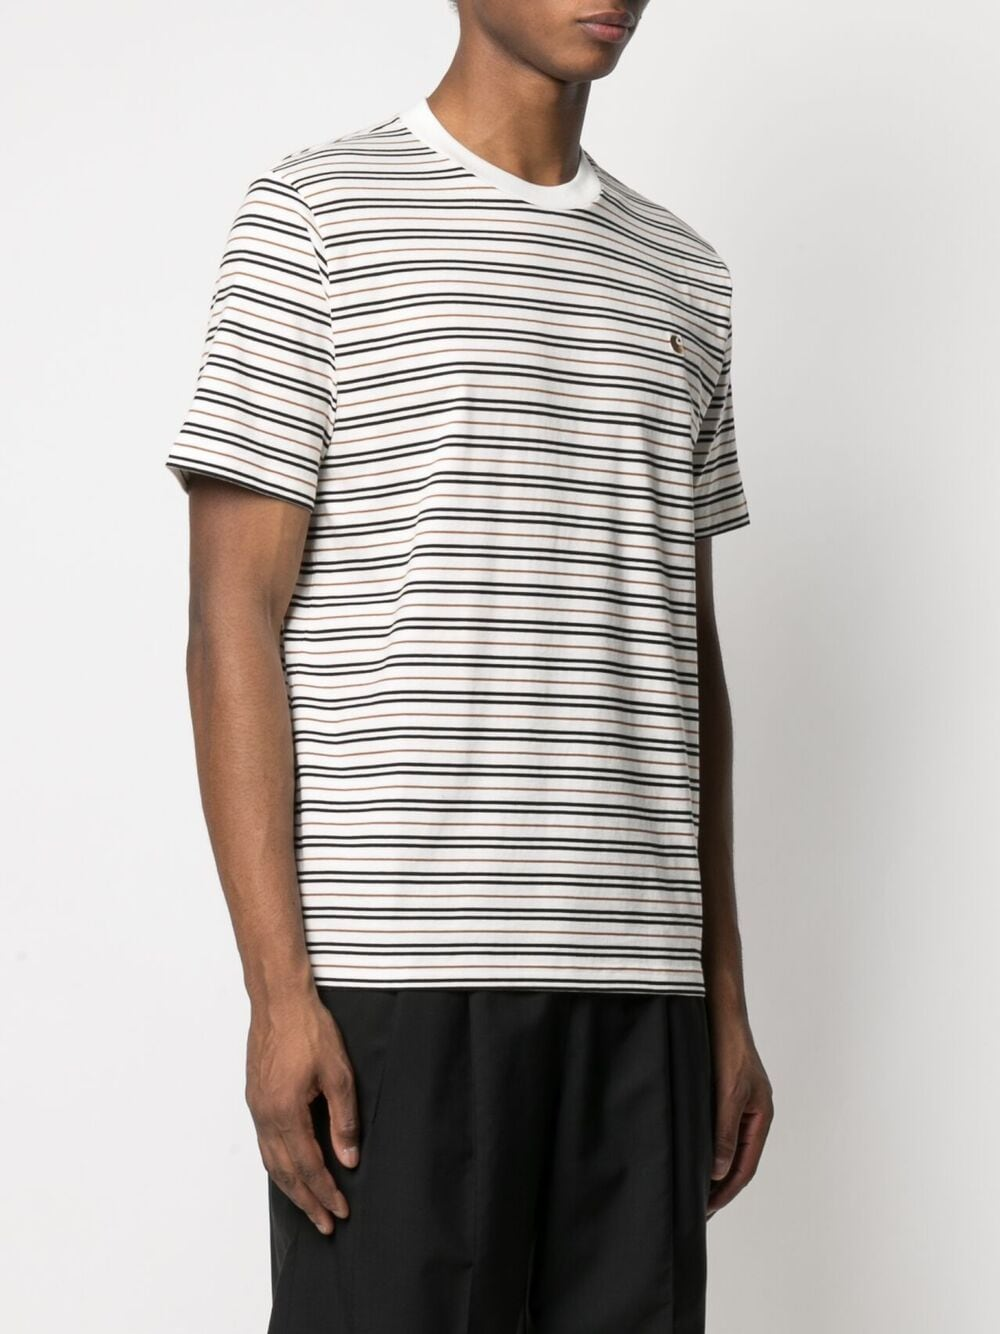 AKRON T-SHIRT CARHARTT WIP   T-shirts   I029003D6.00